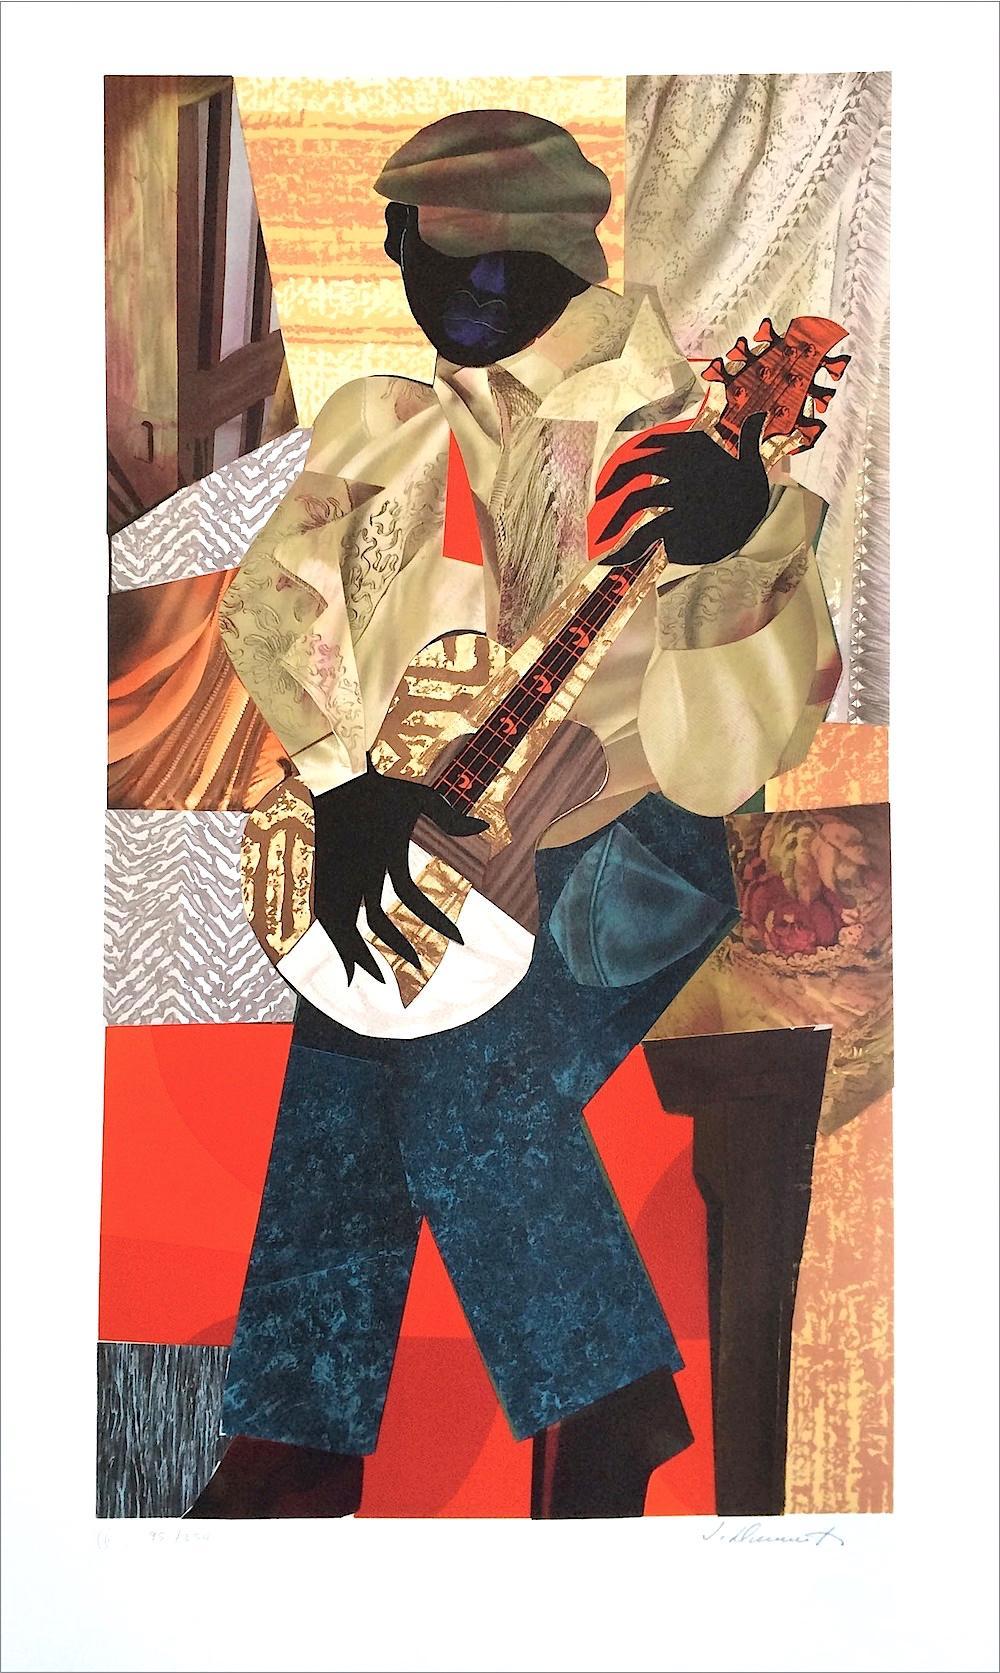 HONKY TONK Signed Lithograph, Black Musician, Collage Portrait Blues Guitarist